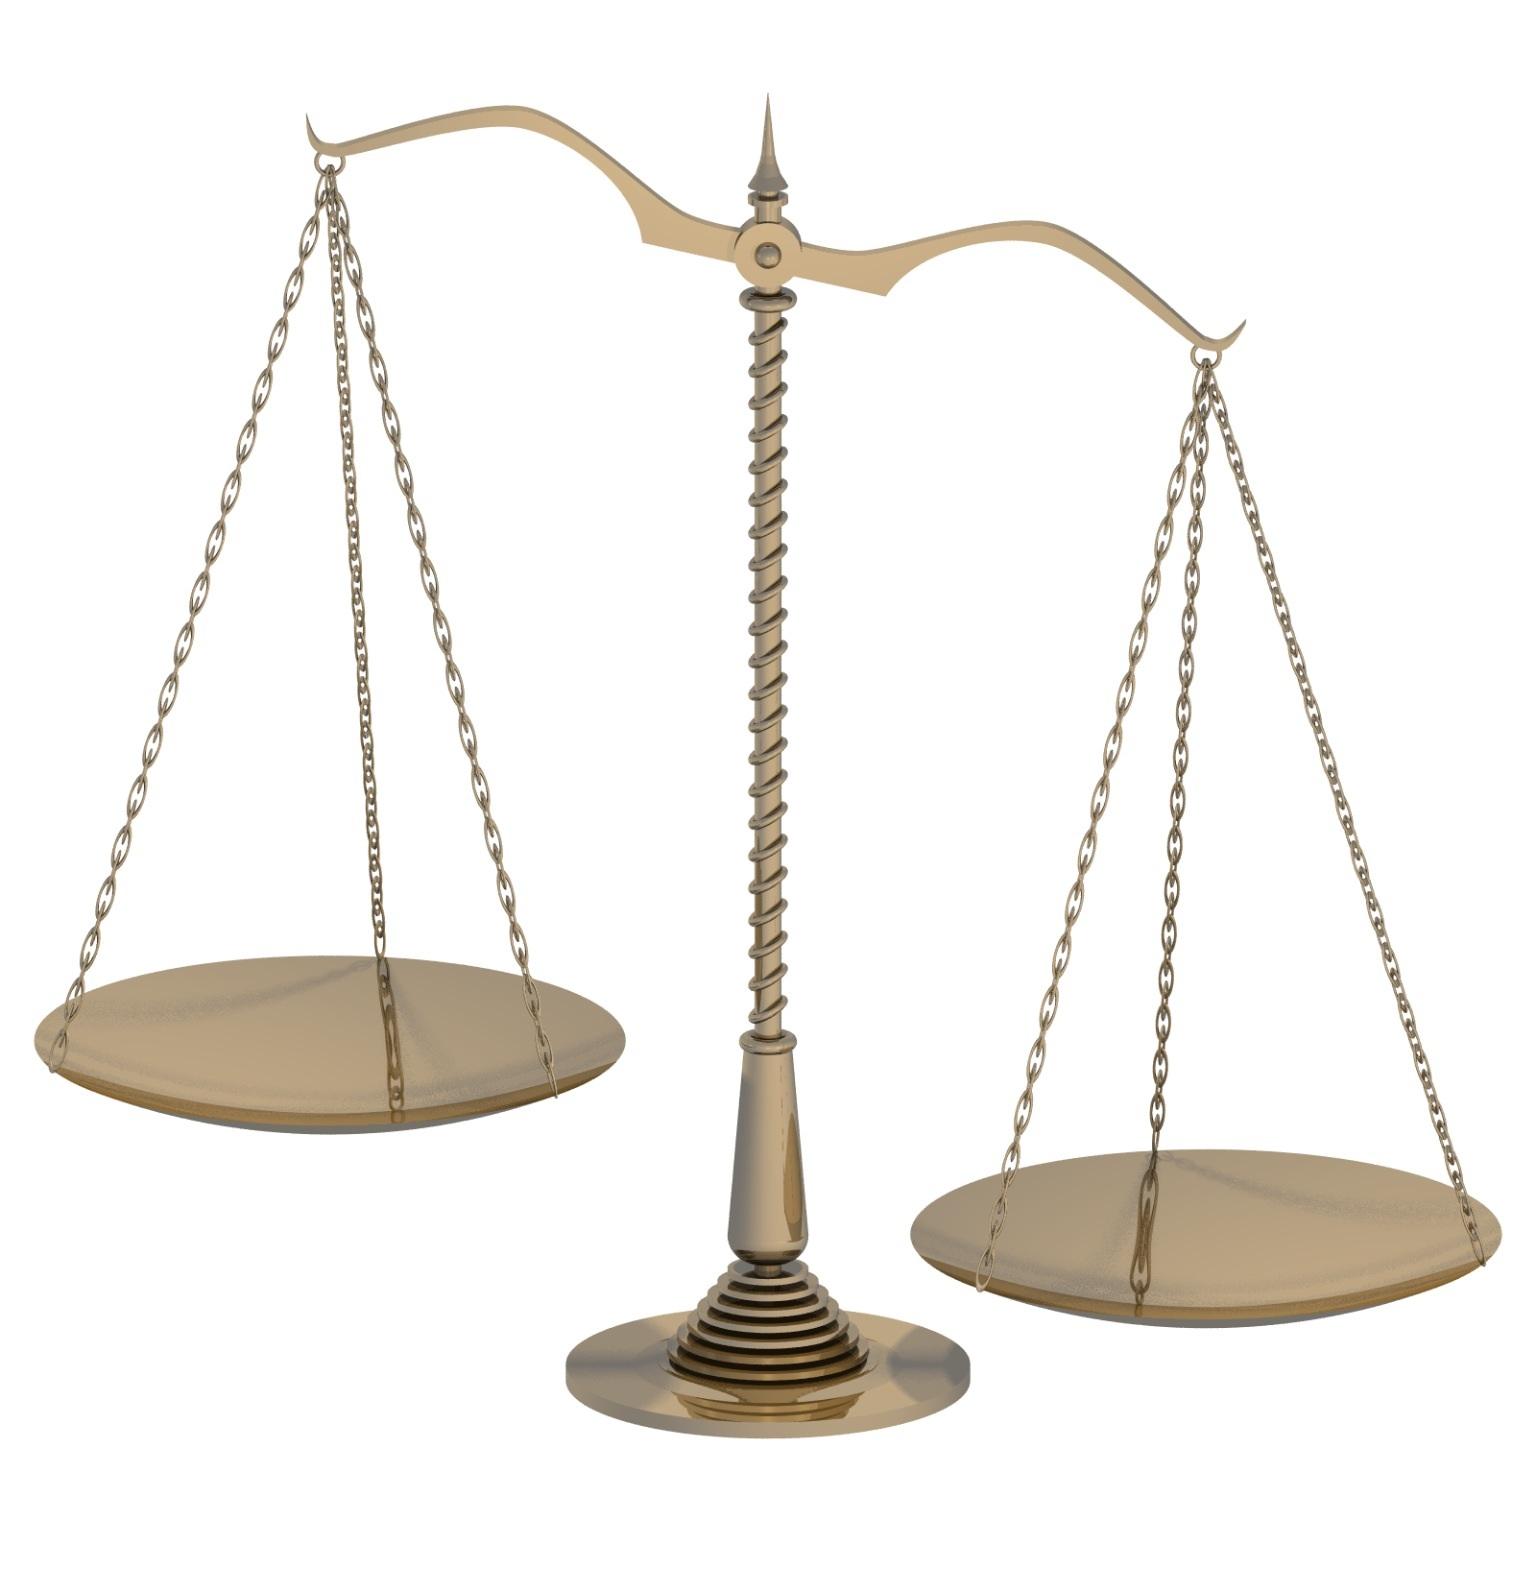 1536x1587 Beam Balance Scale Clipart